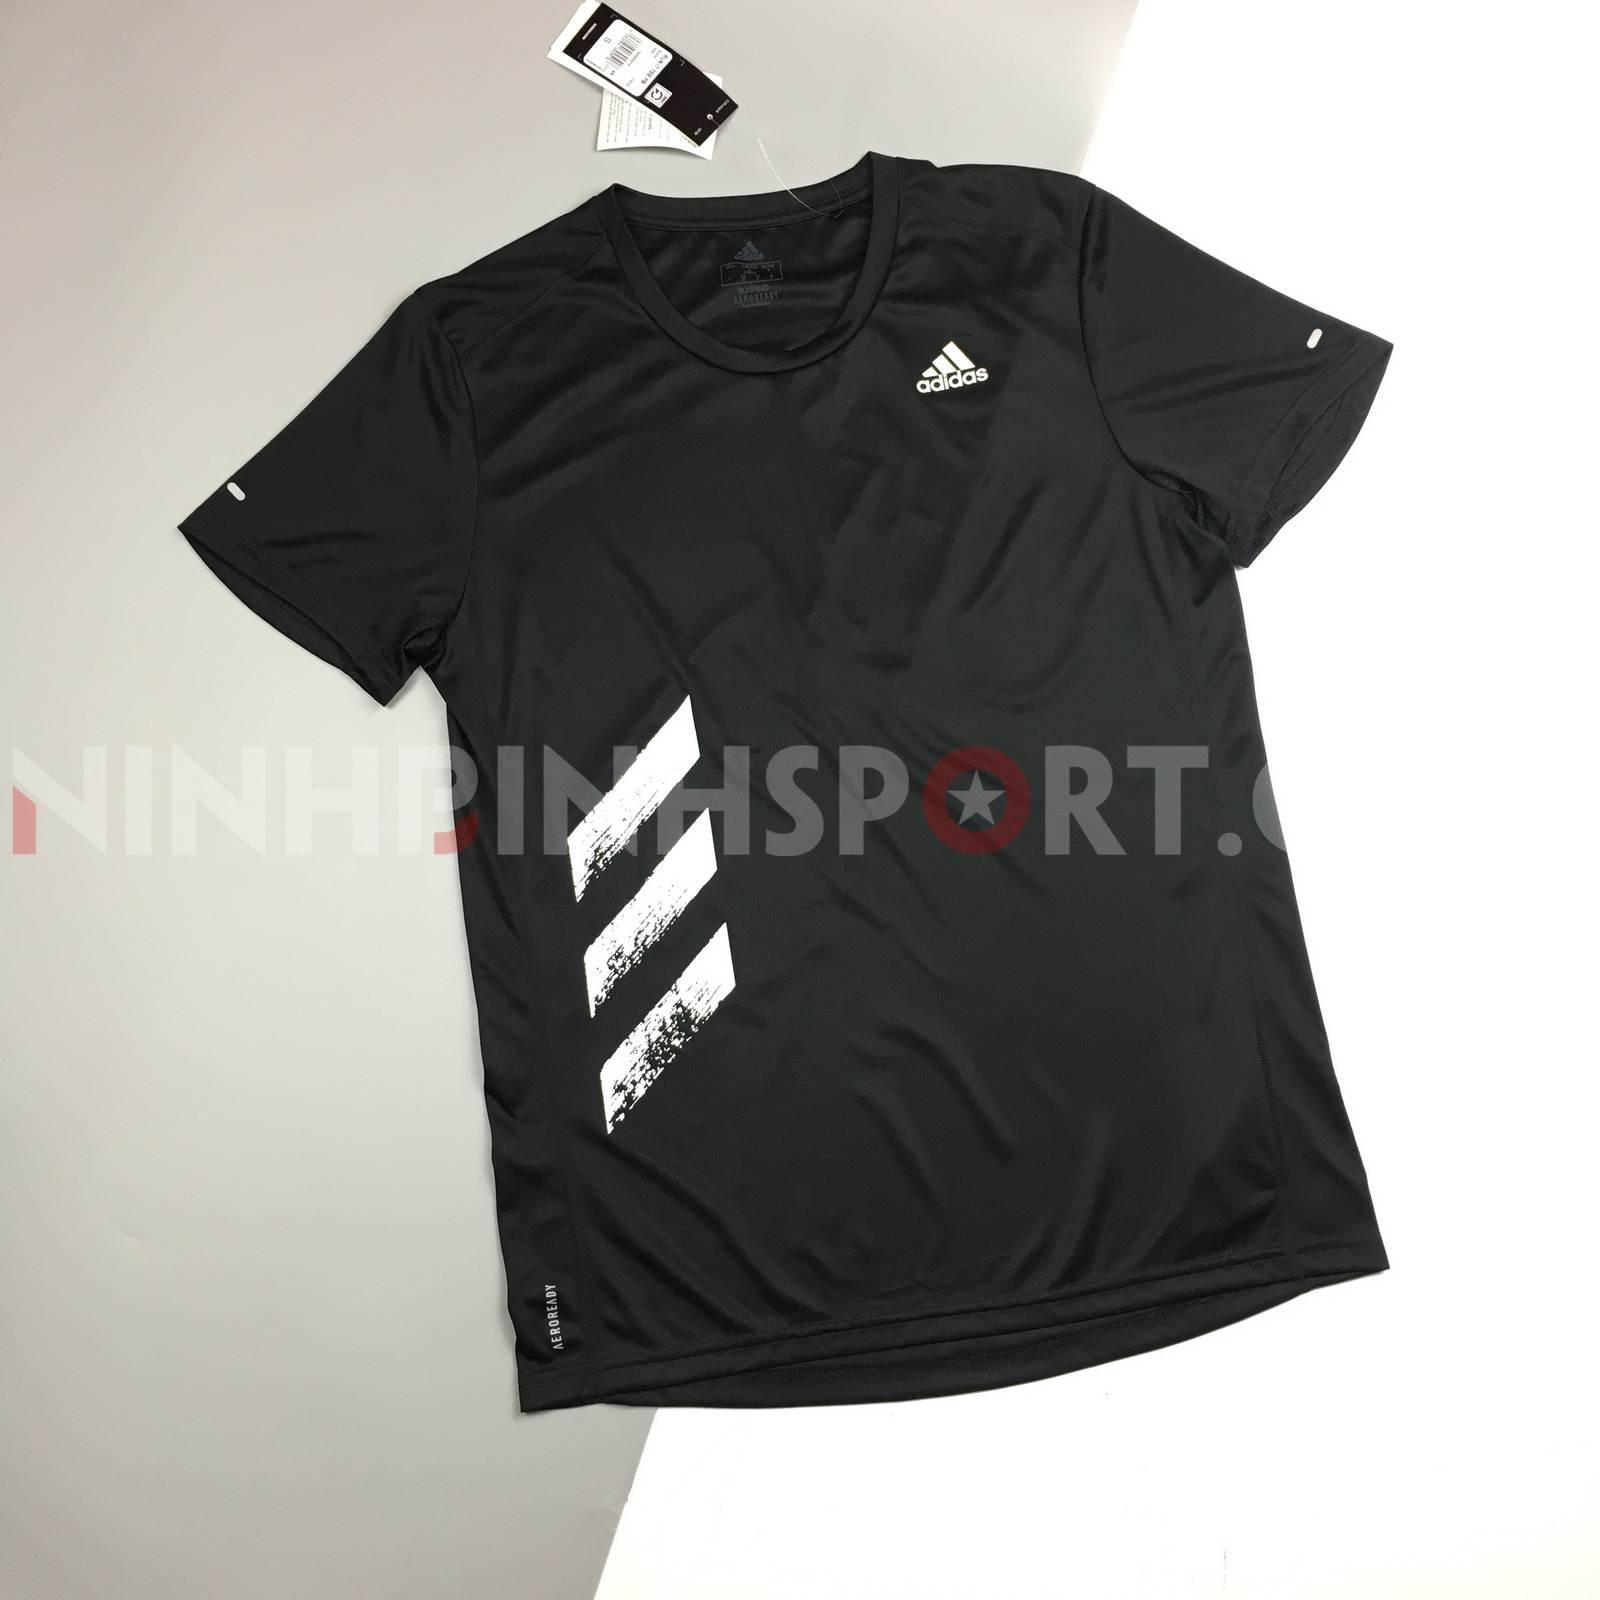 Áo thể thao nam Adidas RUN IT 3-STRIPES PB TEE FR8382